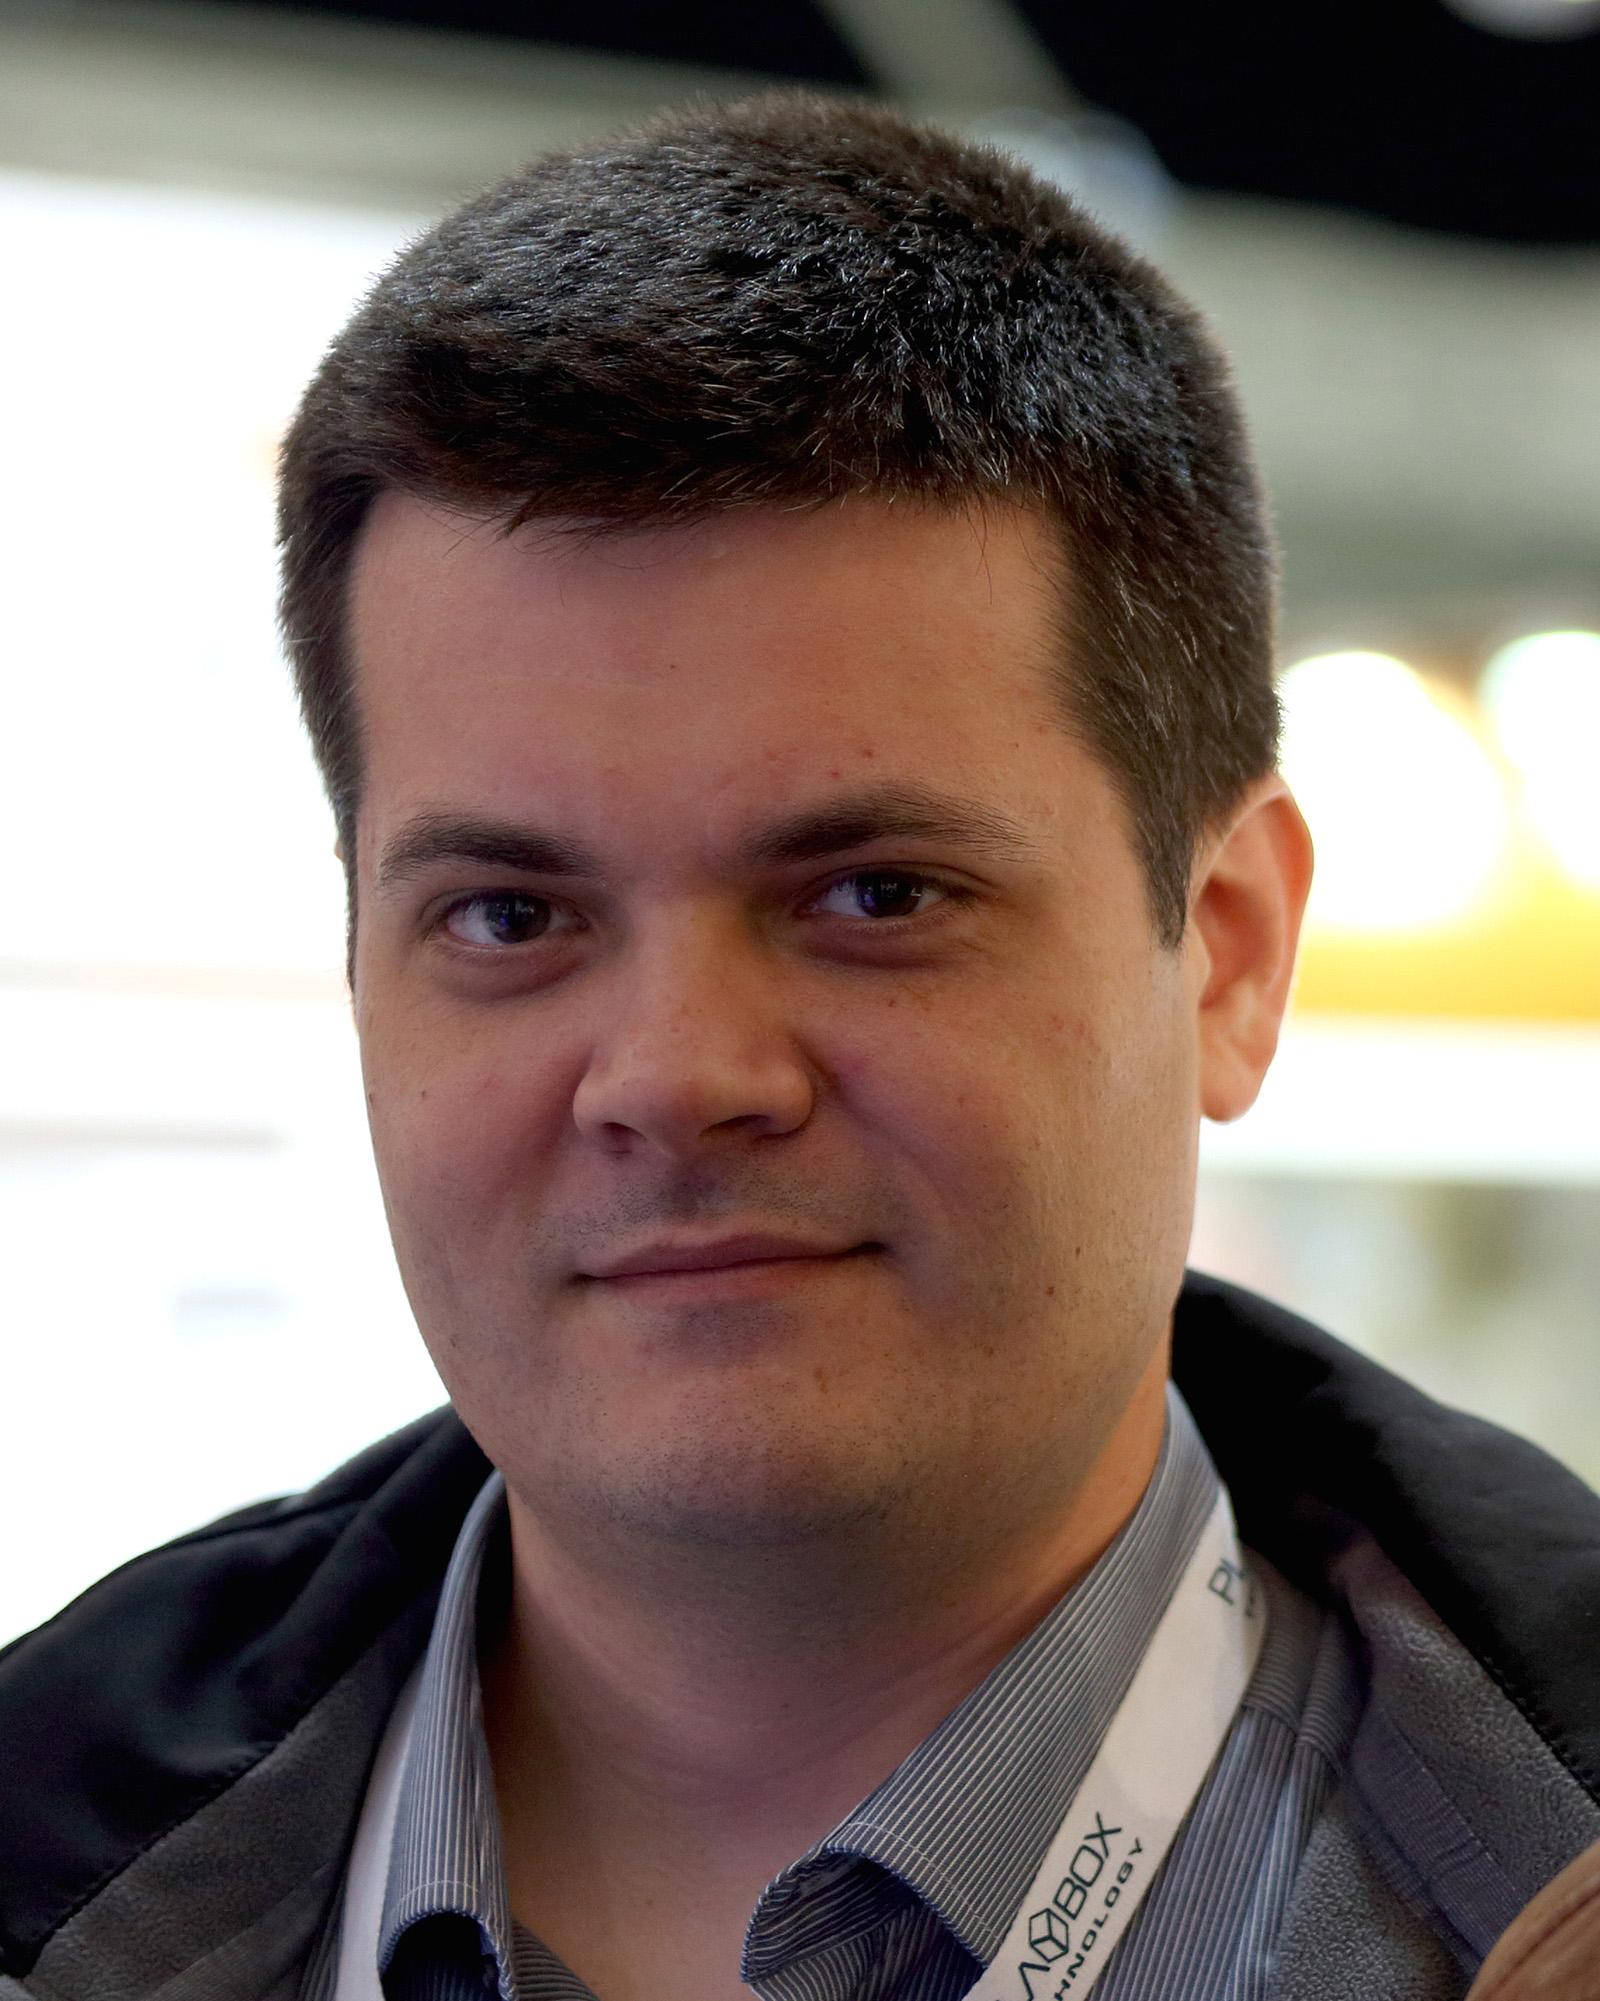 Sunny Petkov